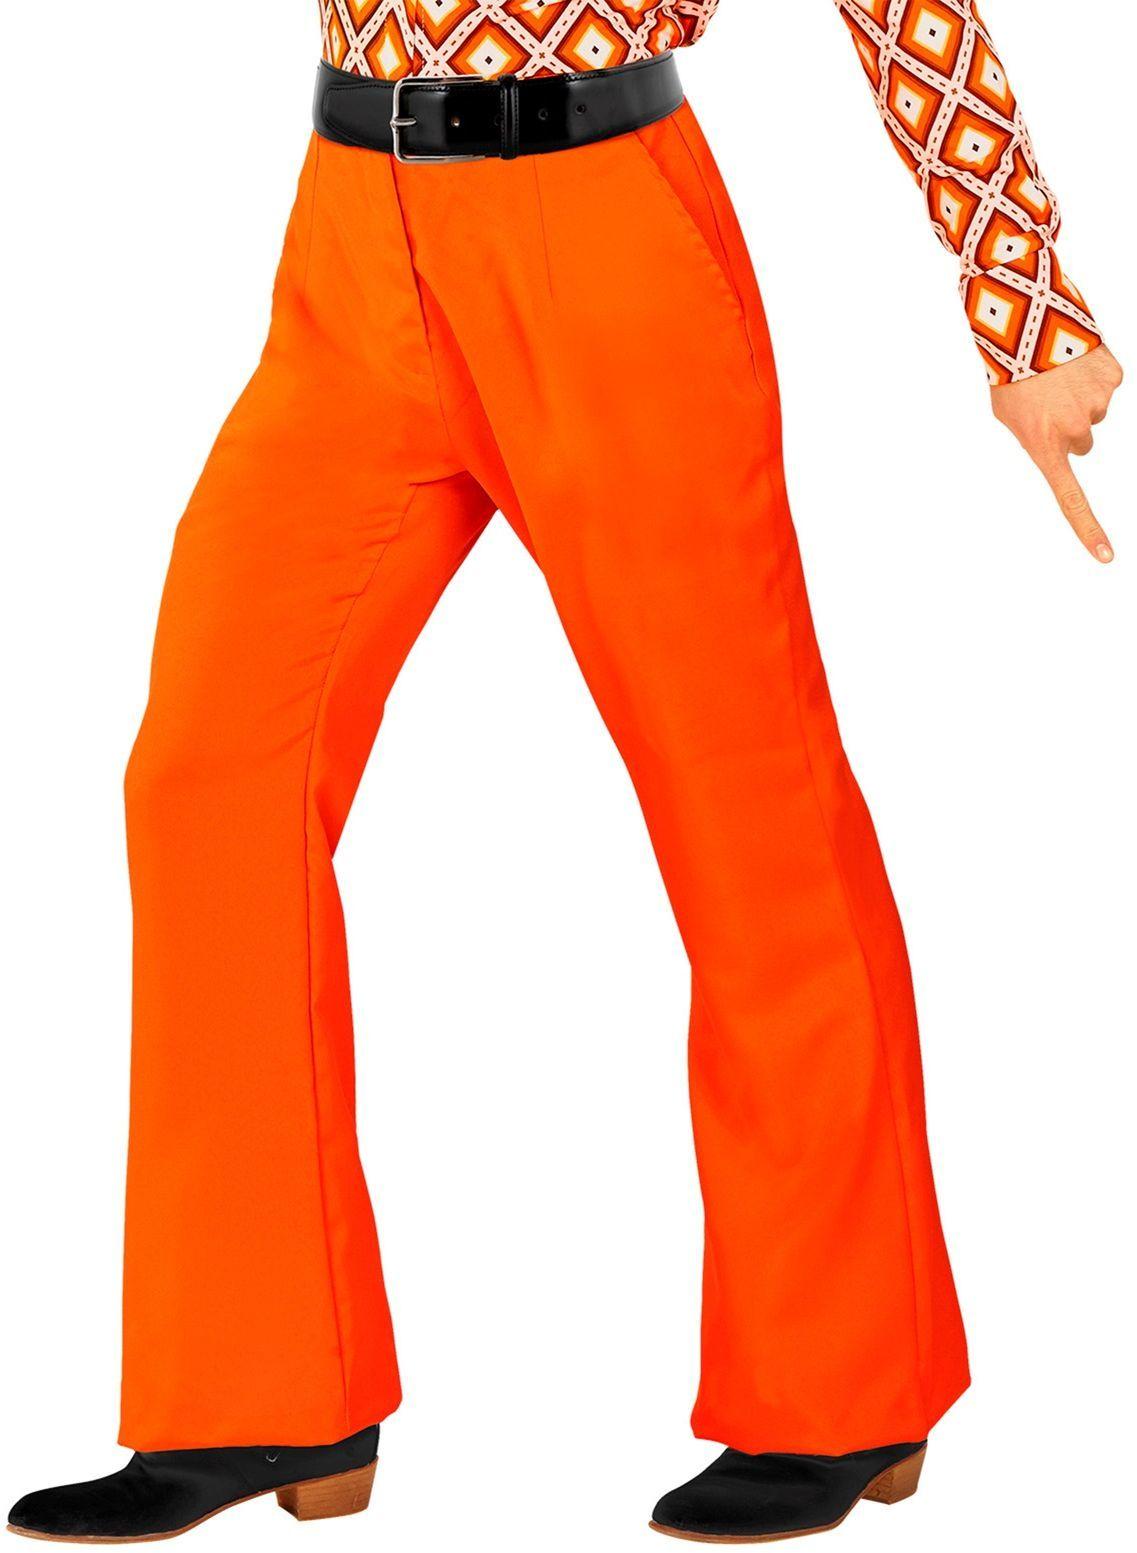 70s broek oranje